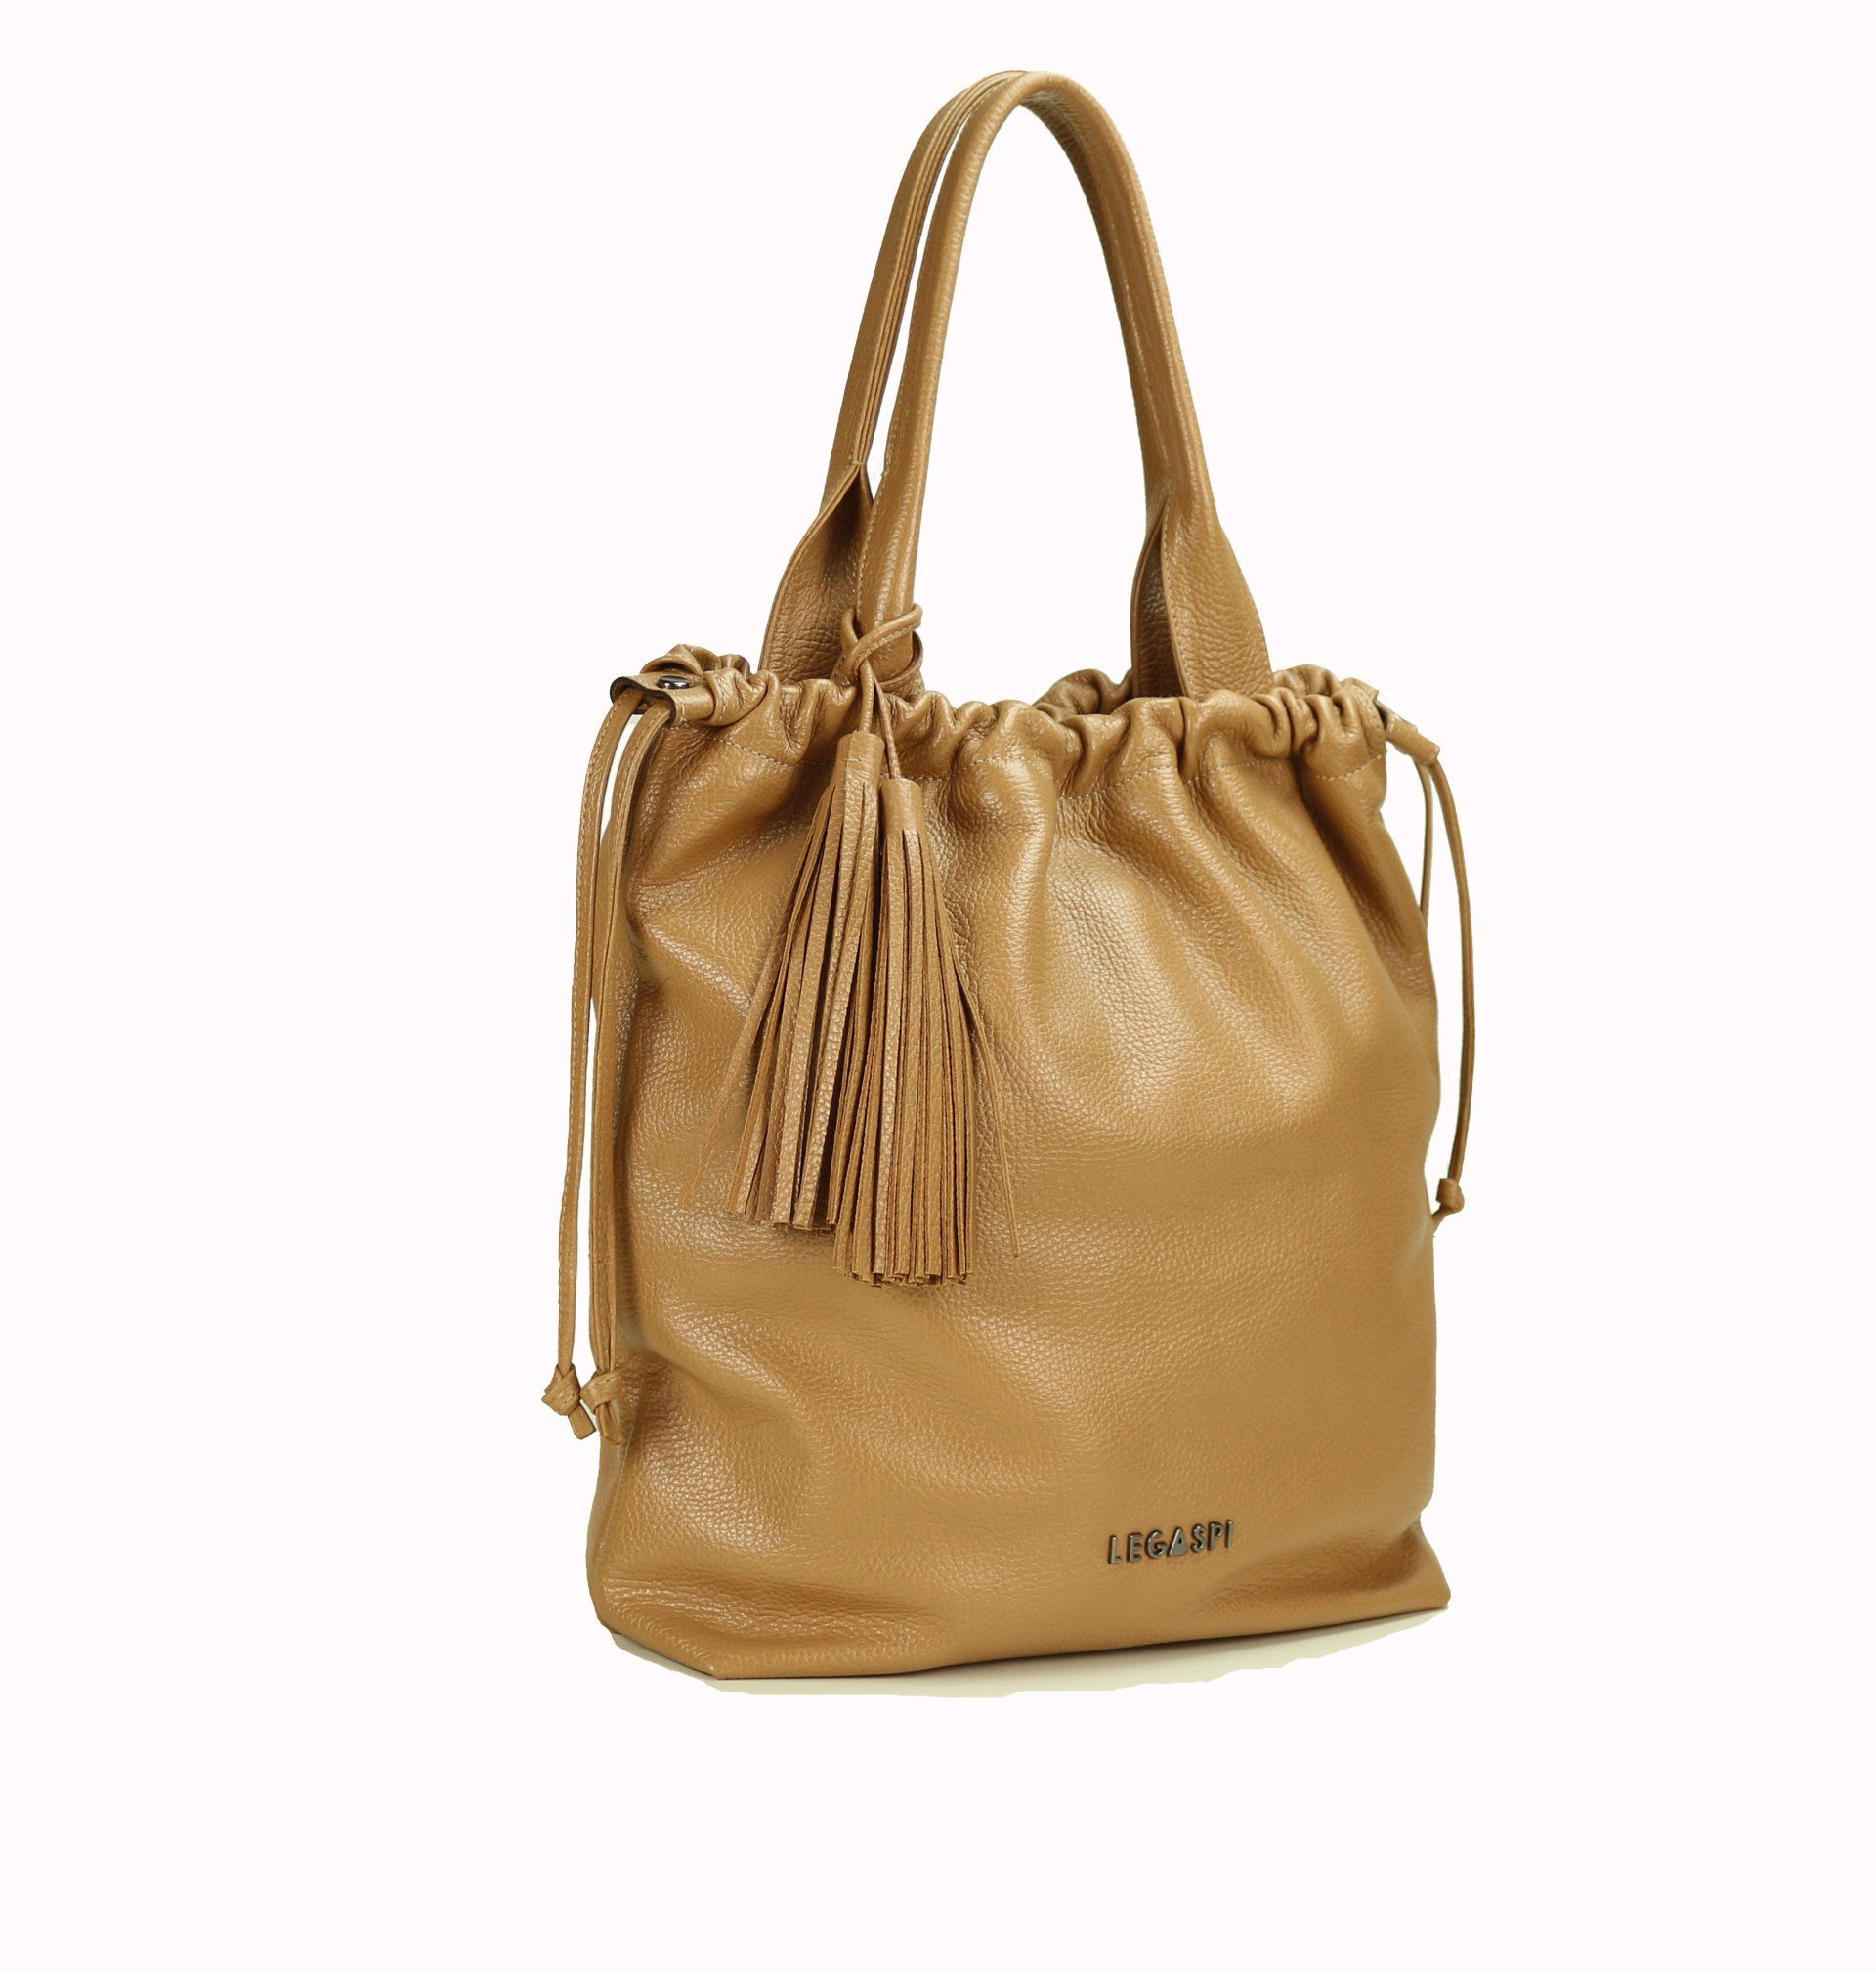 Bolsa de couro Rosemarie 10599